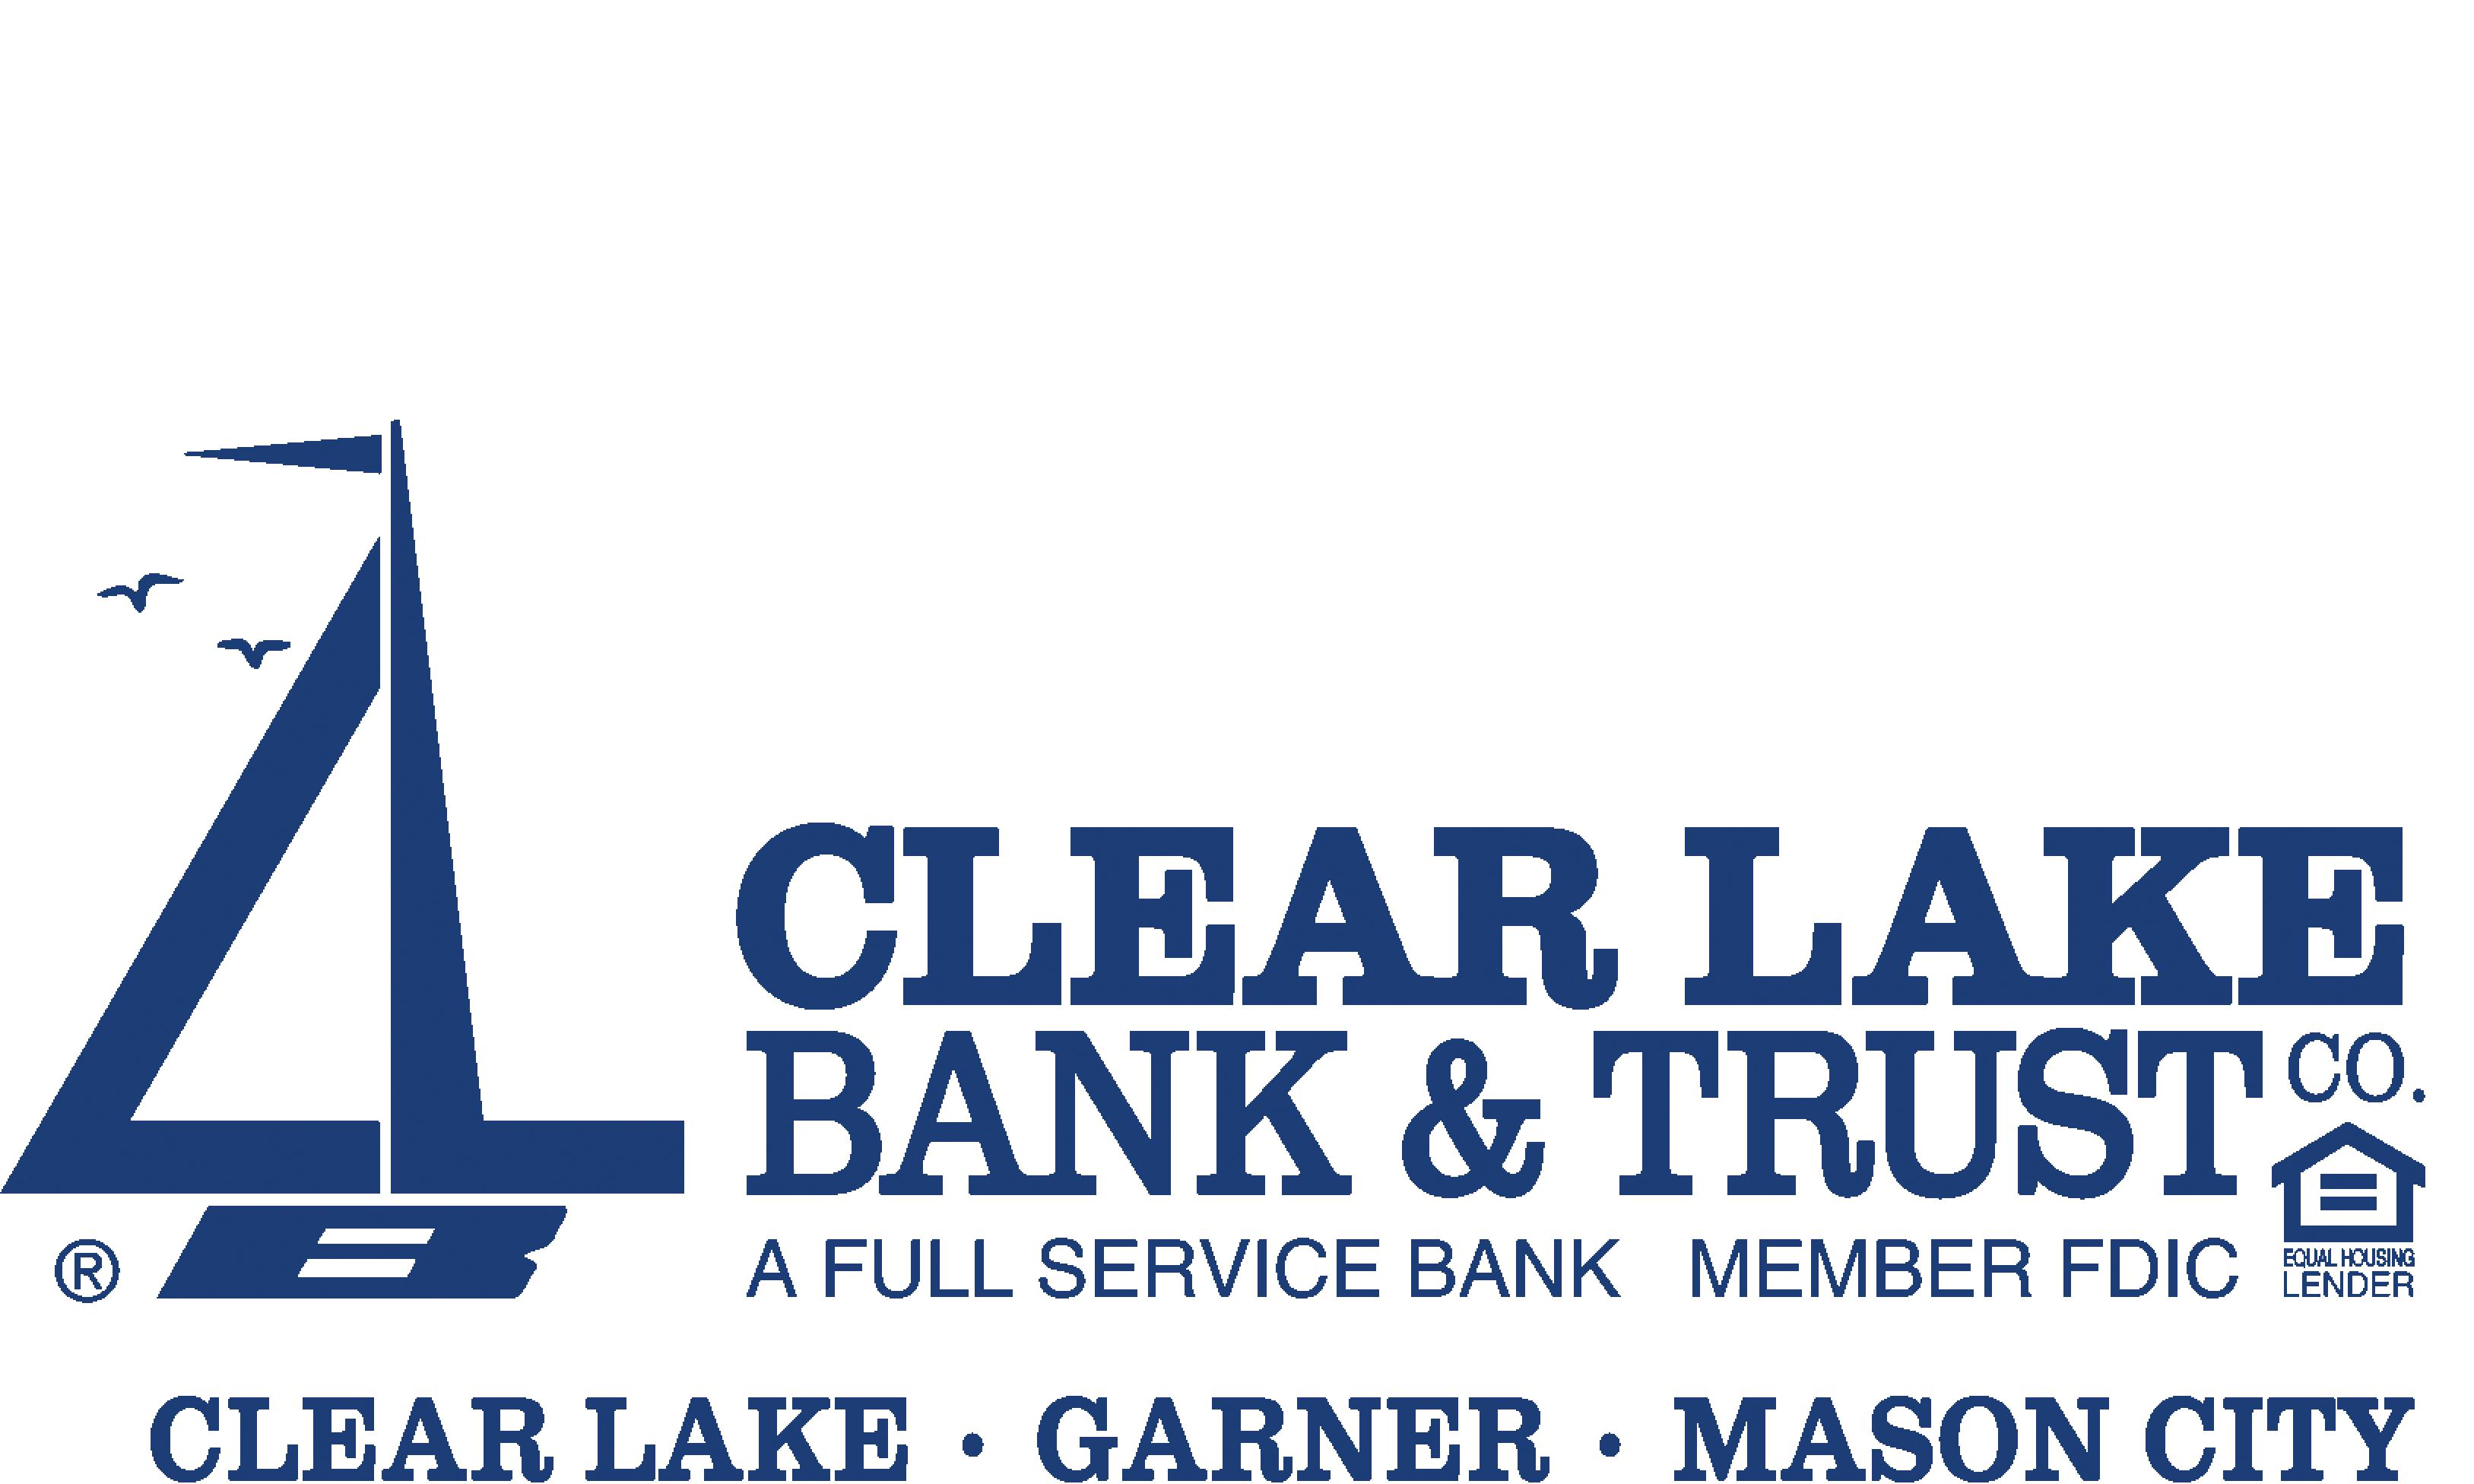 Clear Lake Bank & Trust